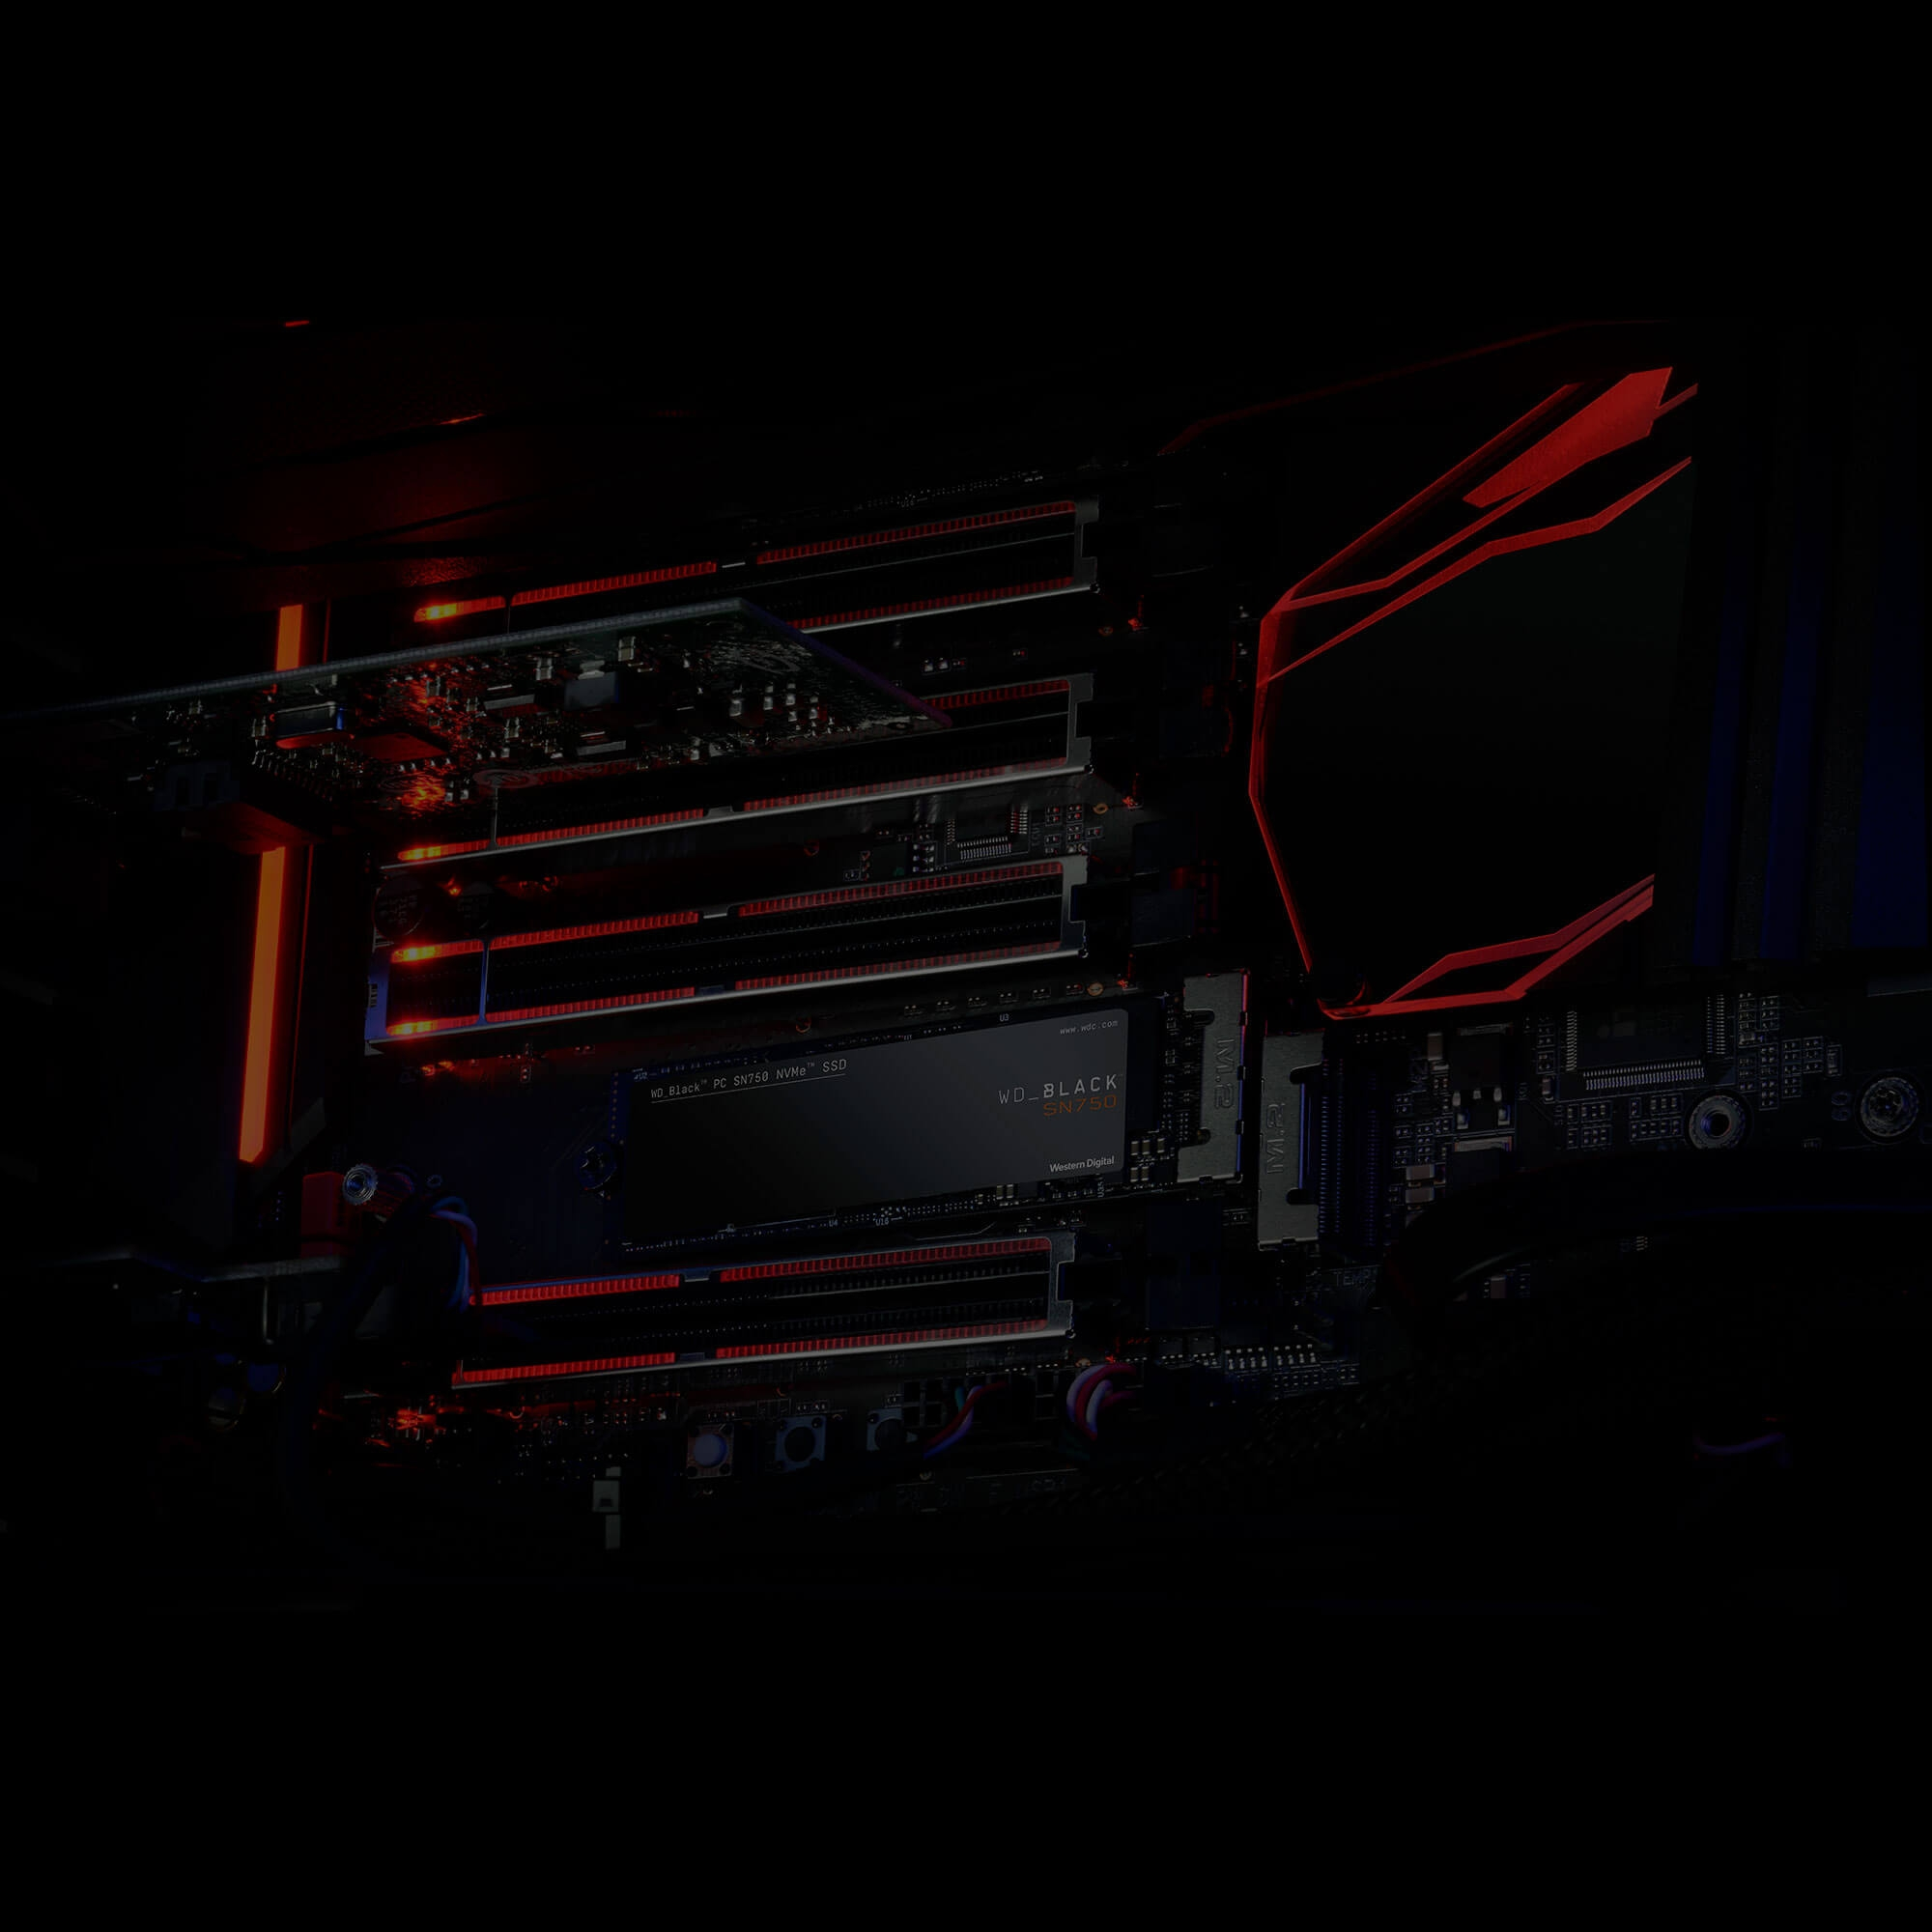 Ổ cứng SSD WD Black 1TB M.2 2280 NVMe PCIe (WDS100T3X0C)_1